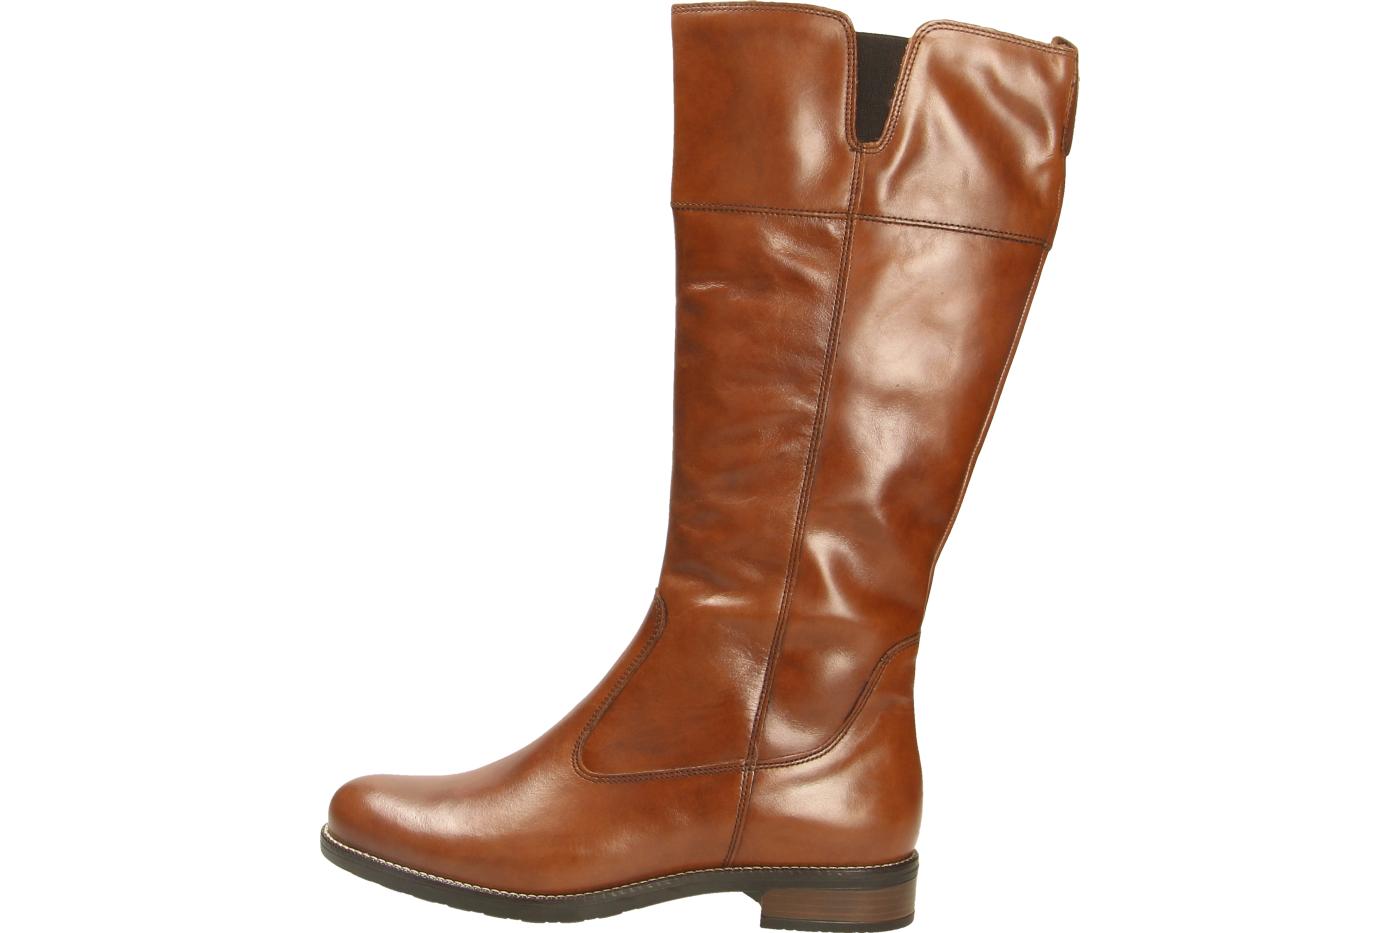 Stiefel 1 1 23455 Tamaris 25542 hCtQxsrd